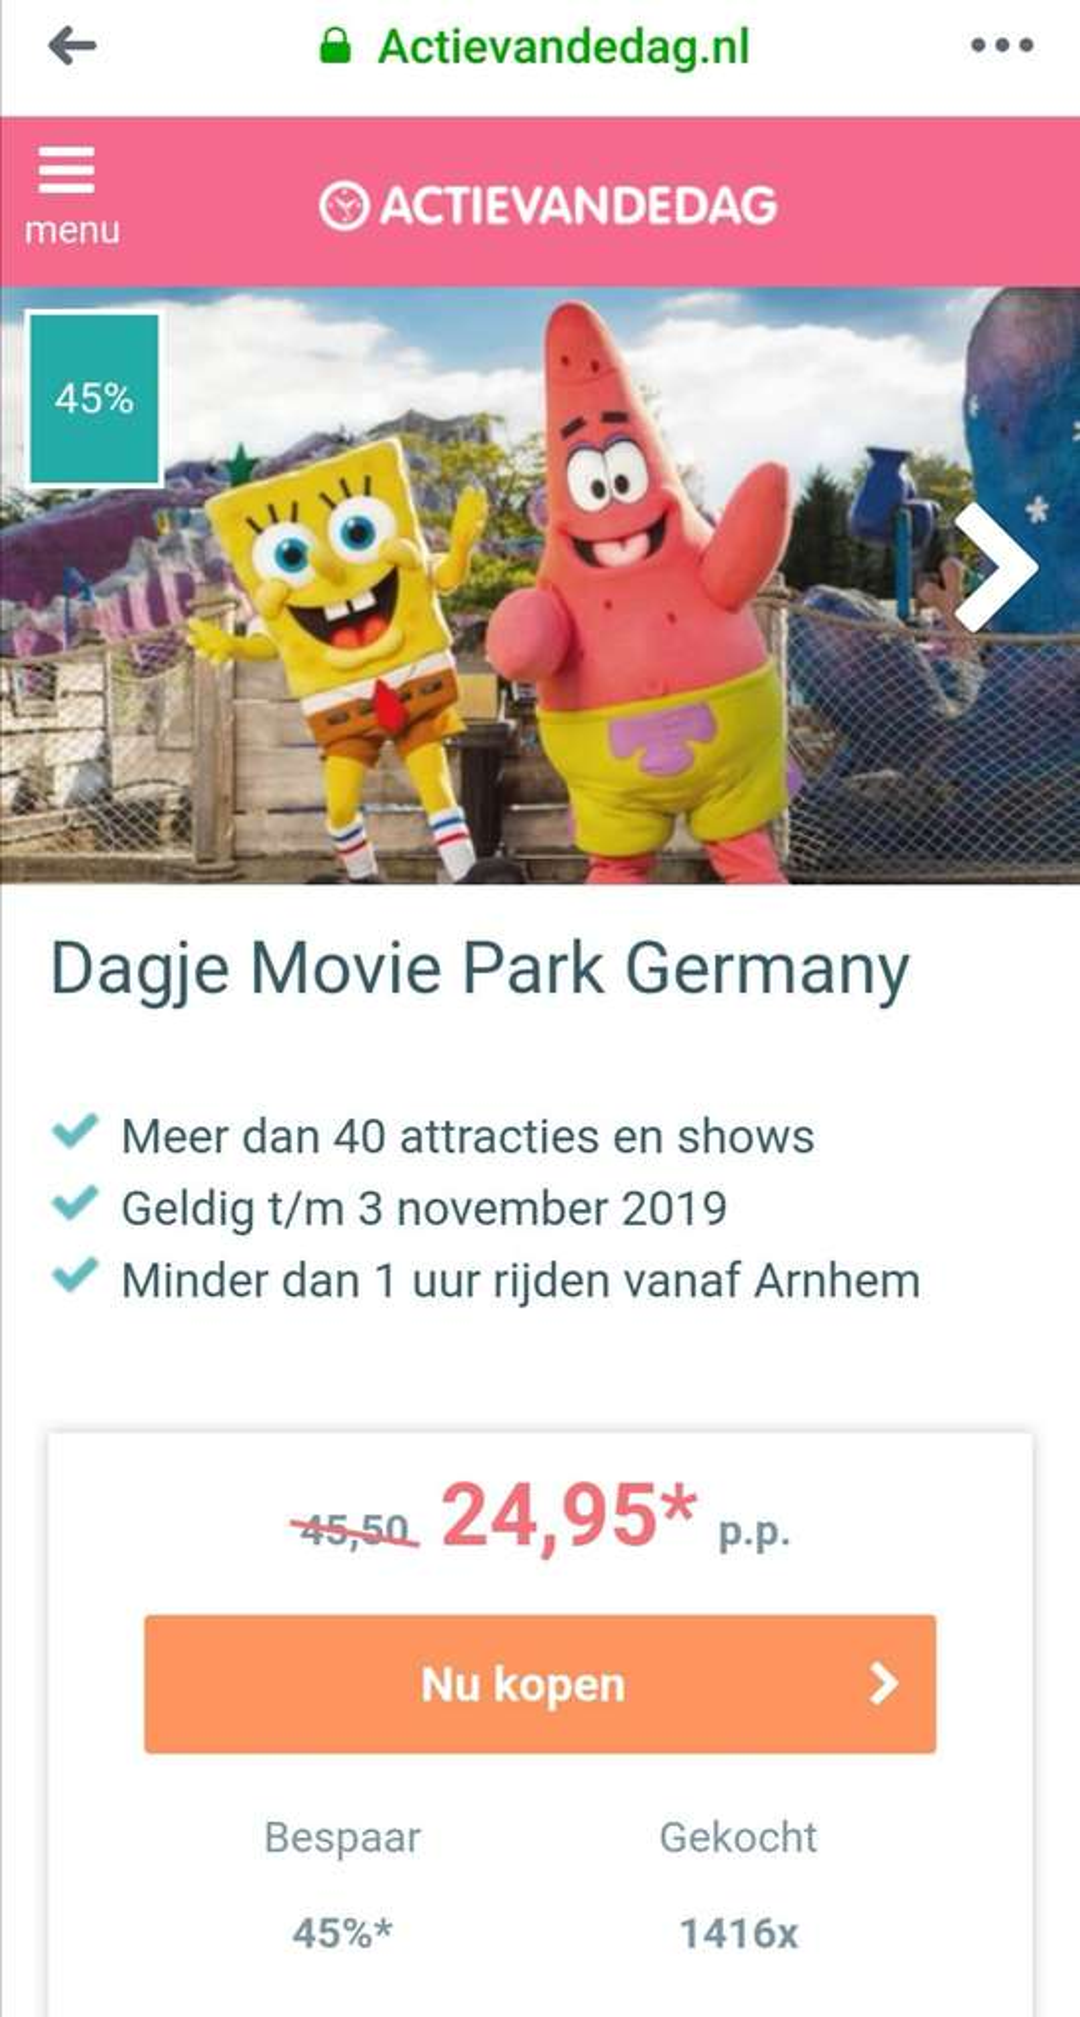 Kortingsbonnen Toverland Uitprinten.Flinke Korting Moviepark Germany Actievandedag Pepper Com